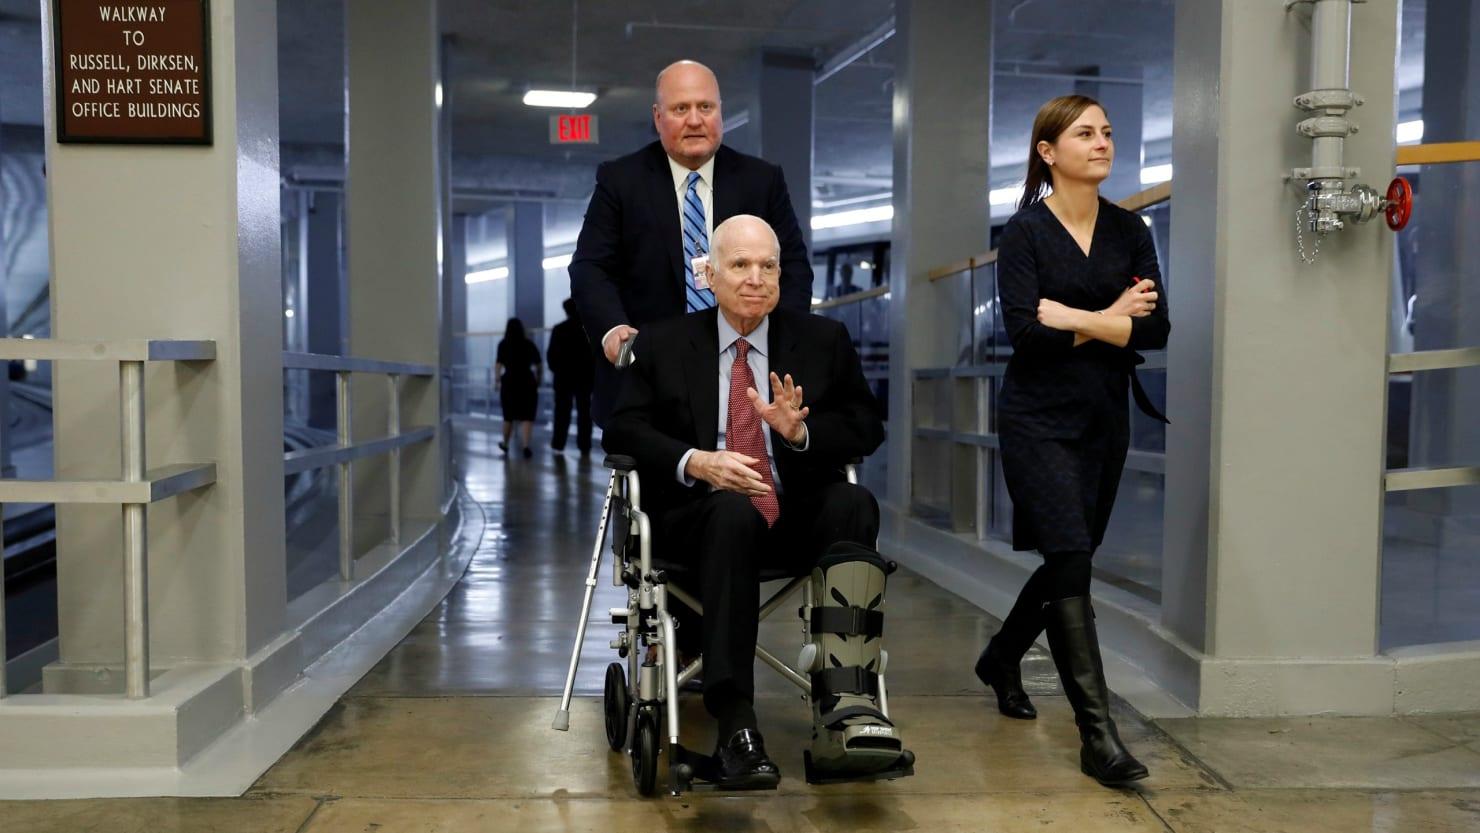 John McCain's Brain Cancer, Glioblastoma, Is Near Impossible to Treat